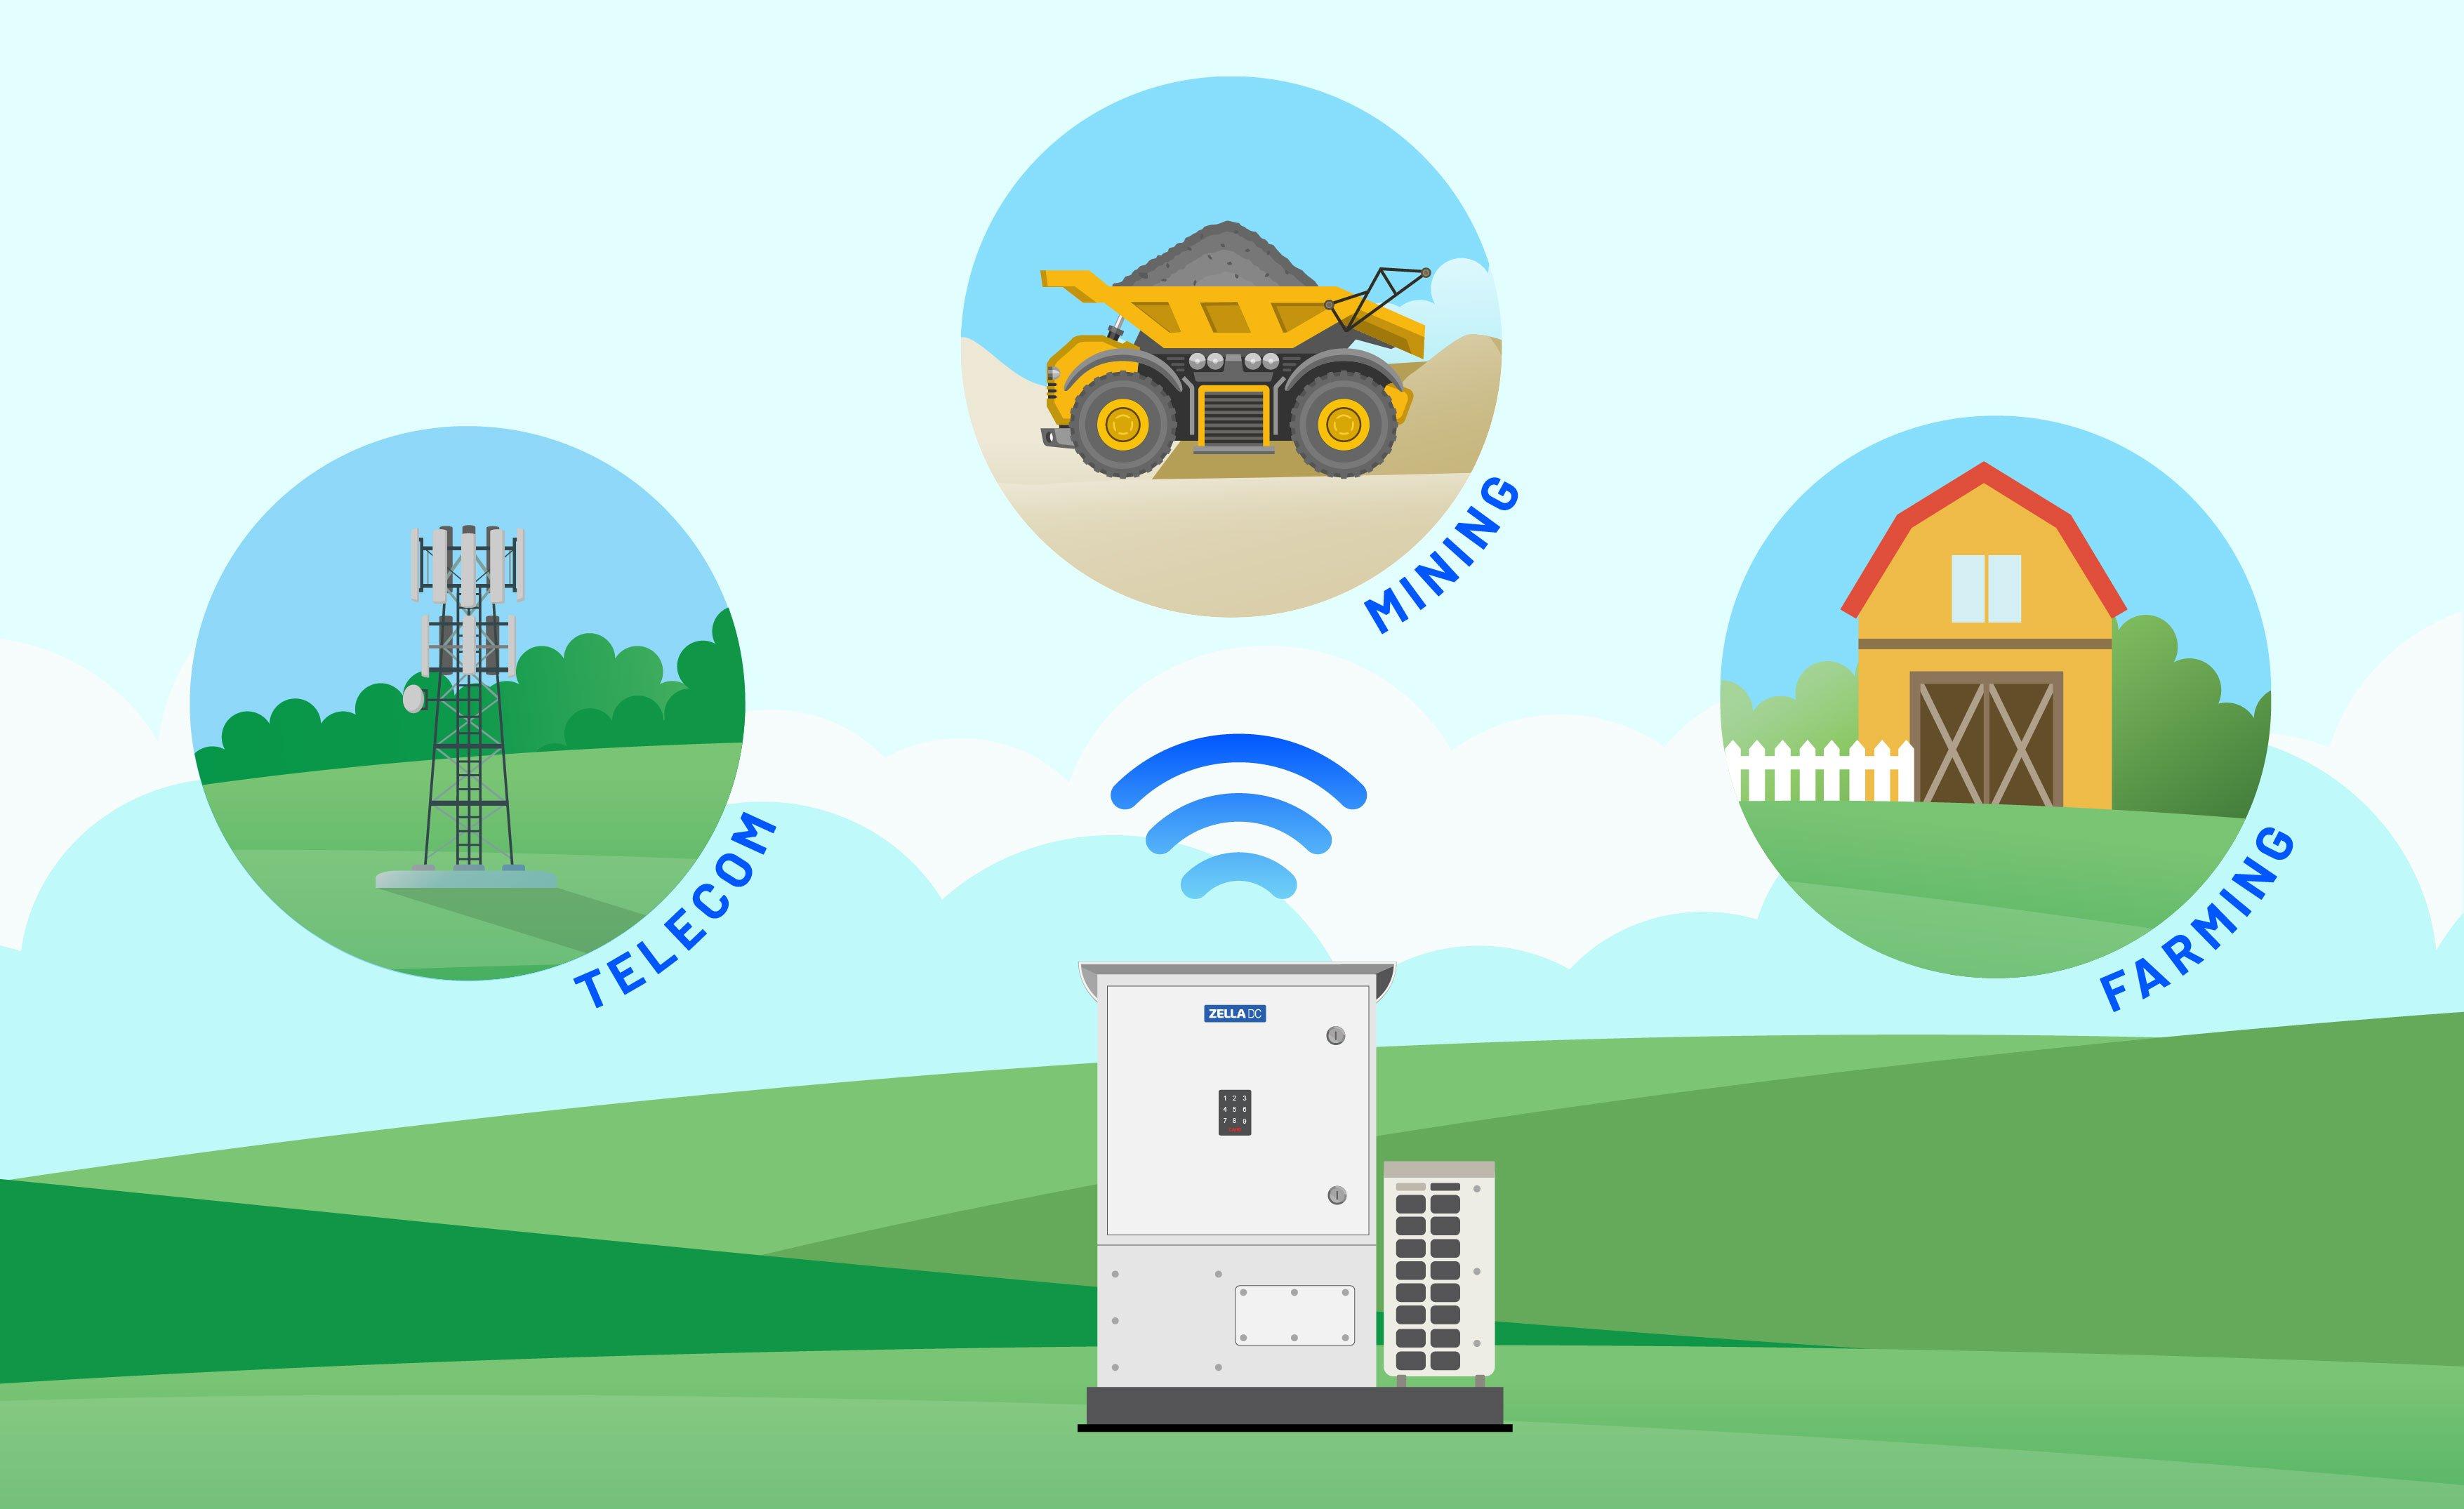 Zella Hut | Industries | Zella DC | Outdoor Micro Data Center | Telecom | Mining | Farming | Micro Data Center | Telecom Towers | Smart Mines | Smart Farming | Water resistant | UV resistant | Wind Power | Solar Power